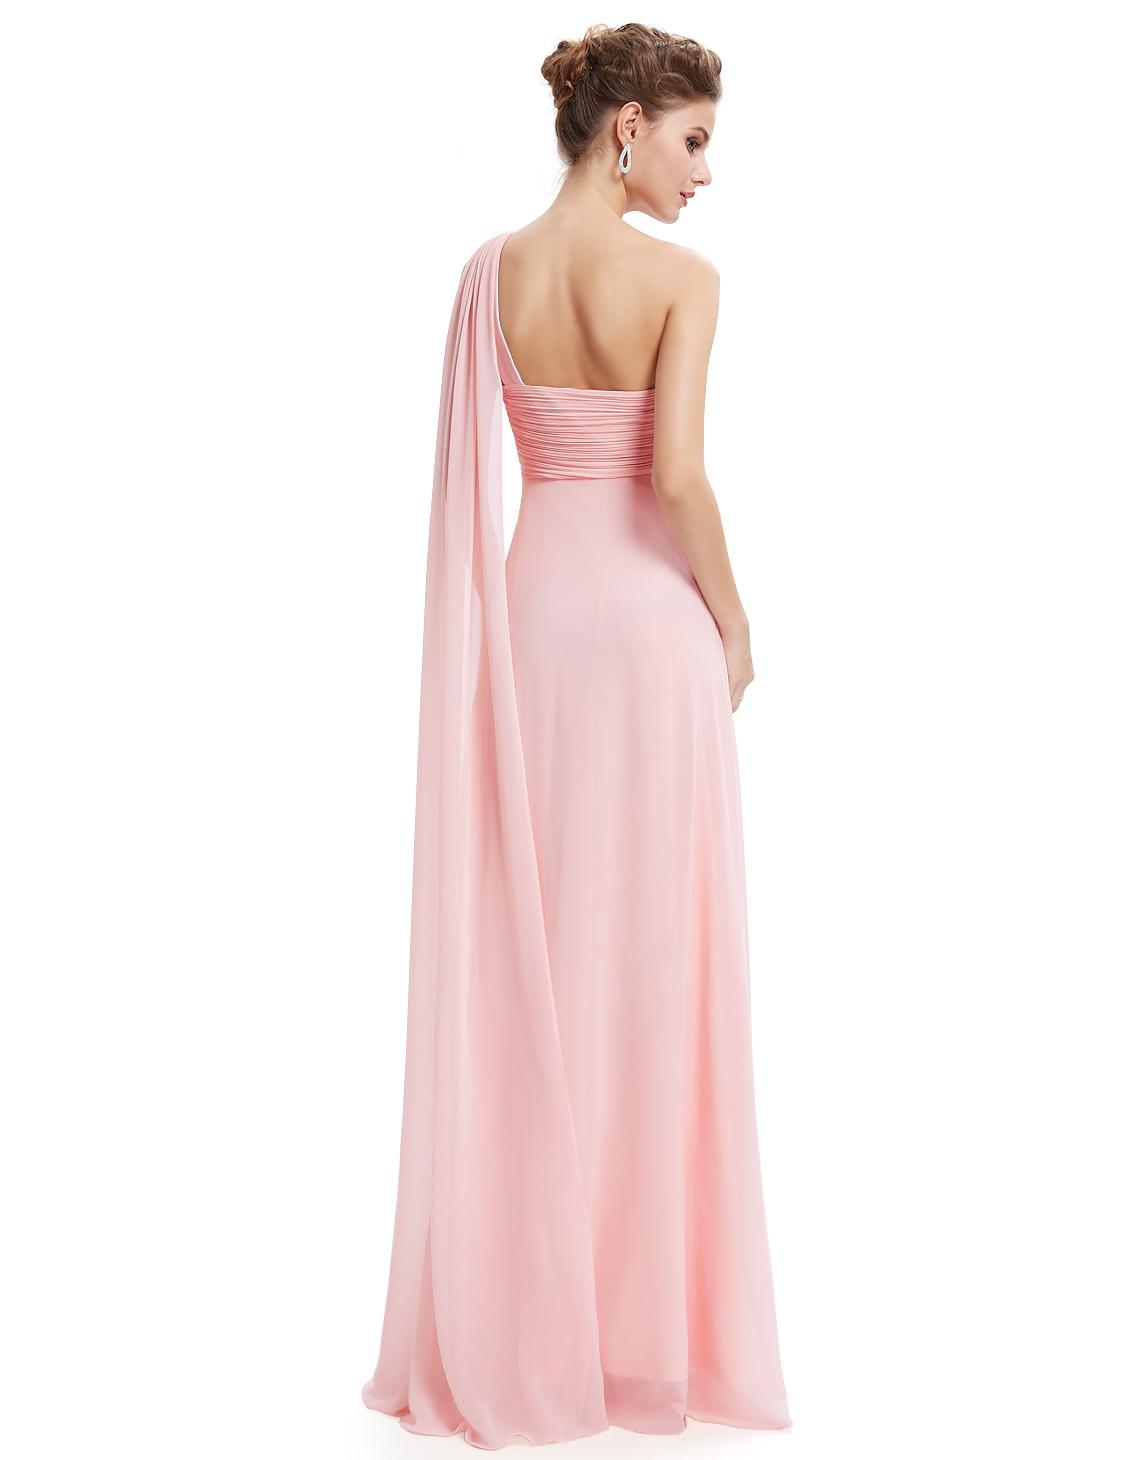 Ever-Pretty-Bridesmaid-Dresses-Chiffon-Ribbon-Long-Formal-Cocktail-Party-Dress thumbnail 21